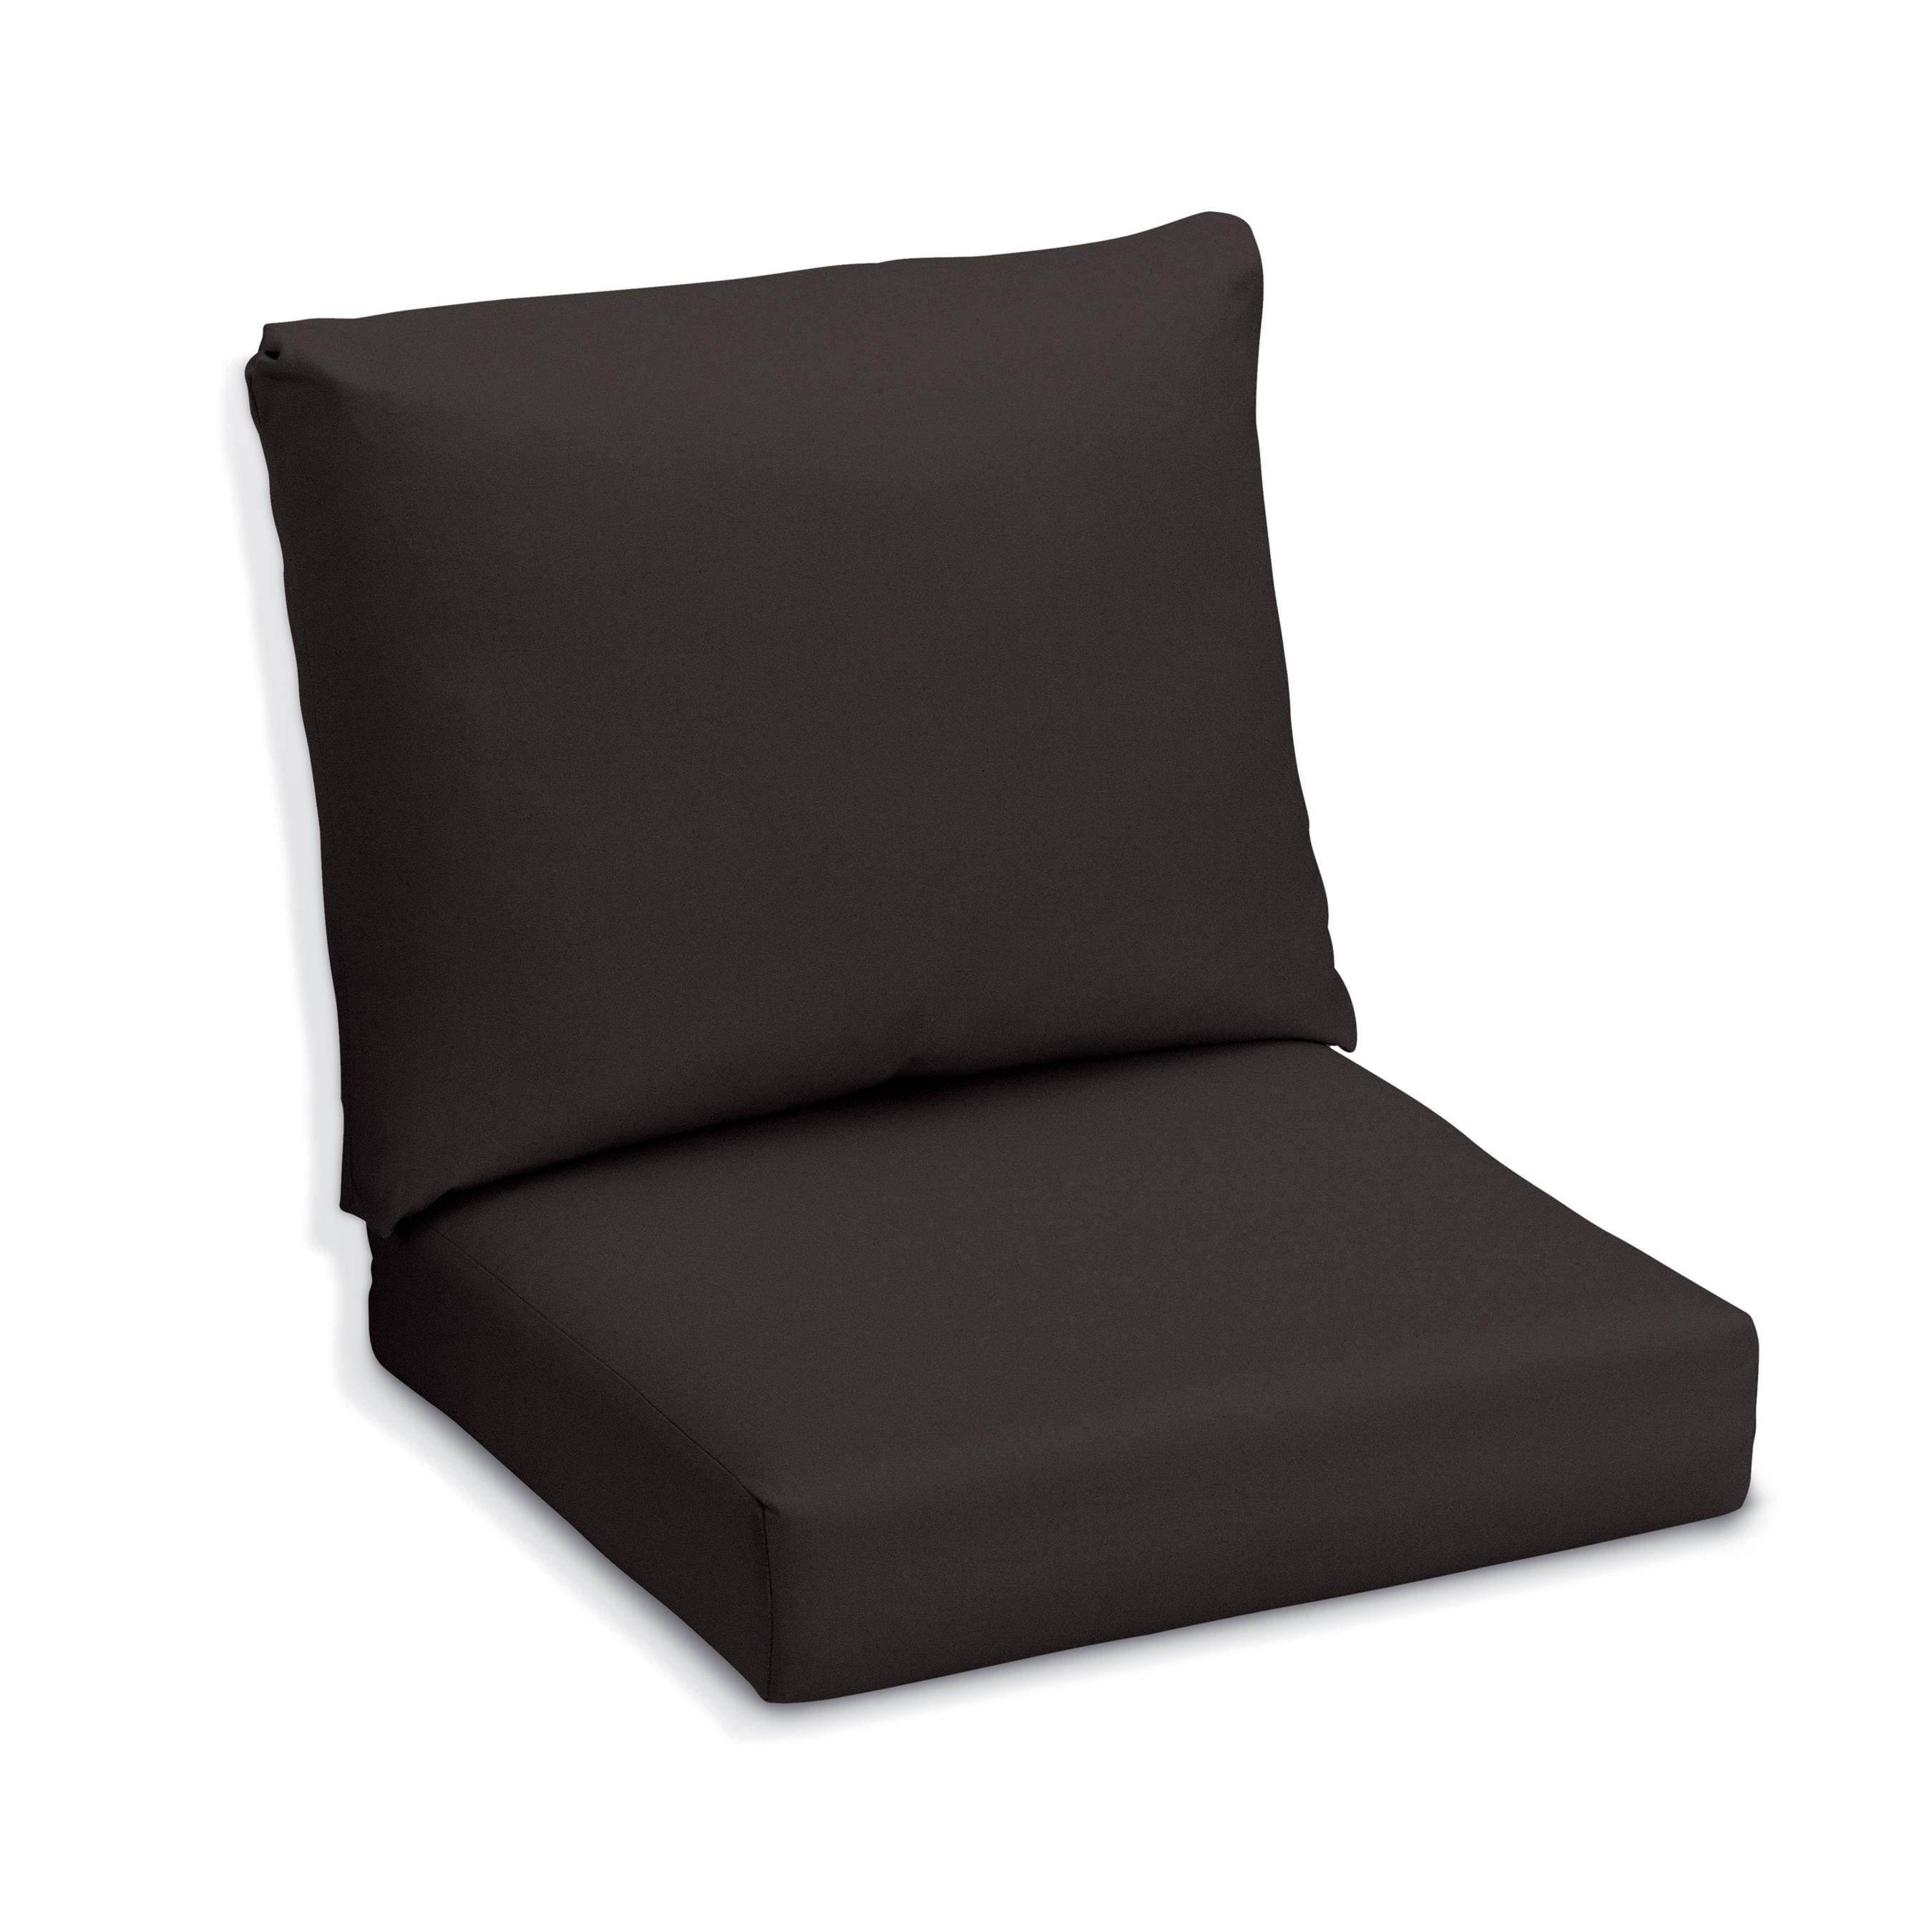 Oxford Garden Black Sunbrella Cushion for Sienna Chairs & Sofa (Black)